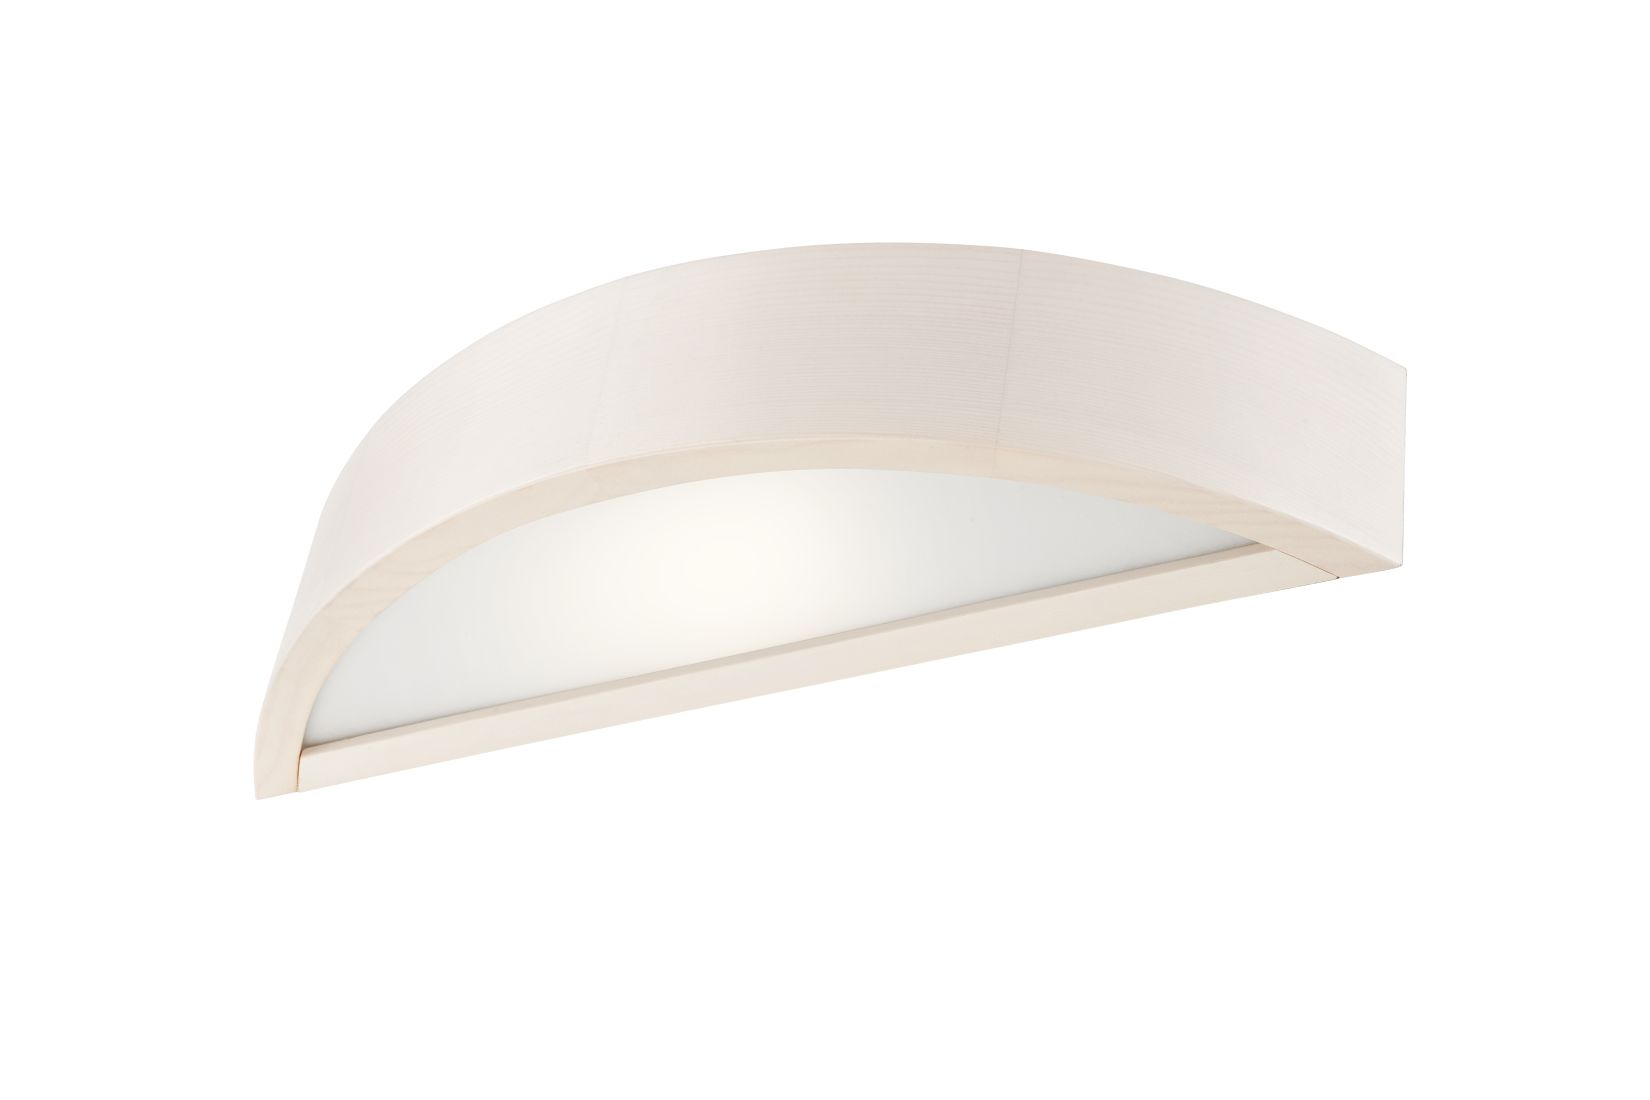 Wandlampe Weiß 40cm Holz Modern vielseitig RUDYARD